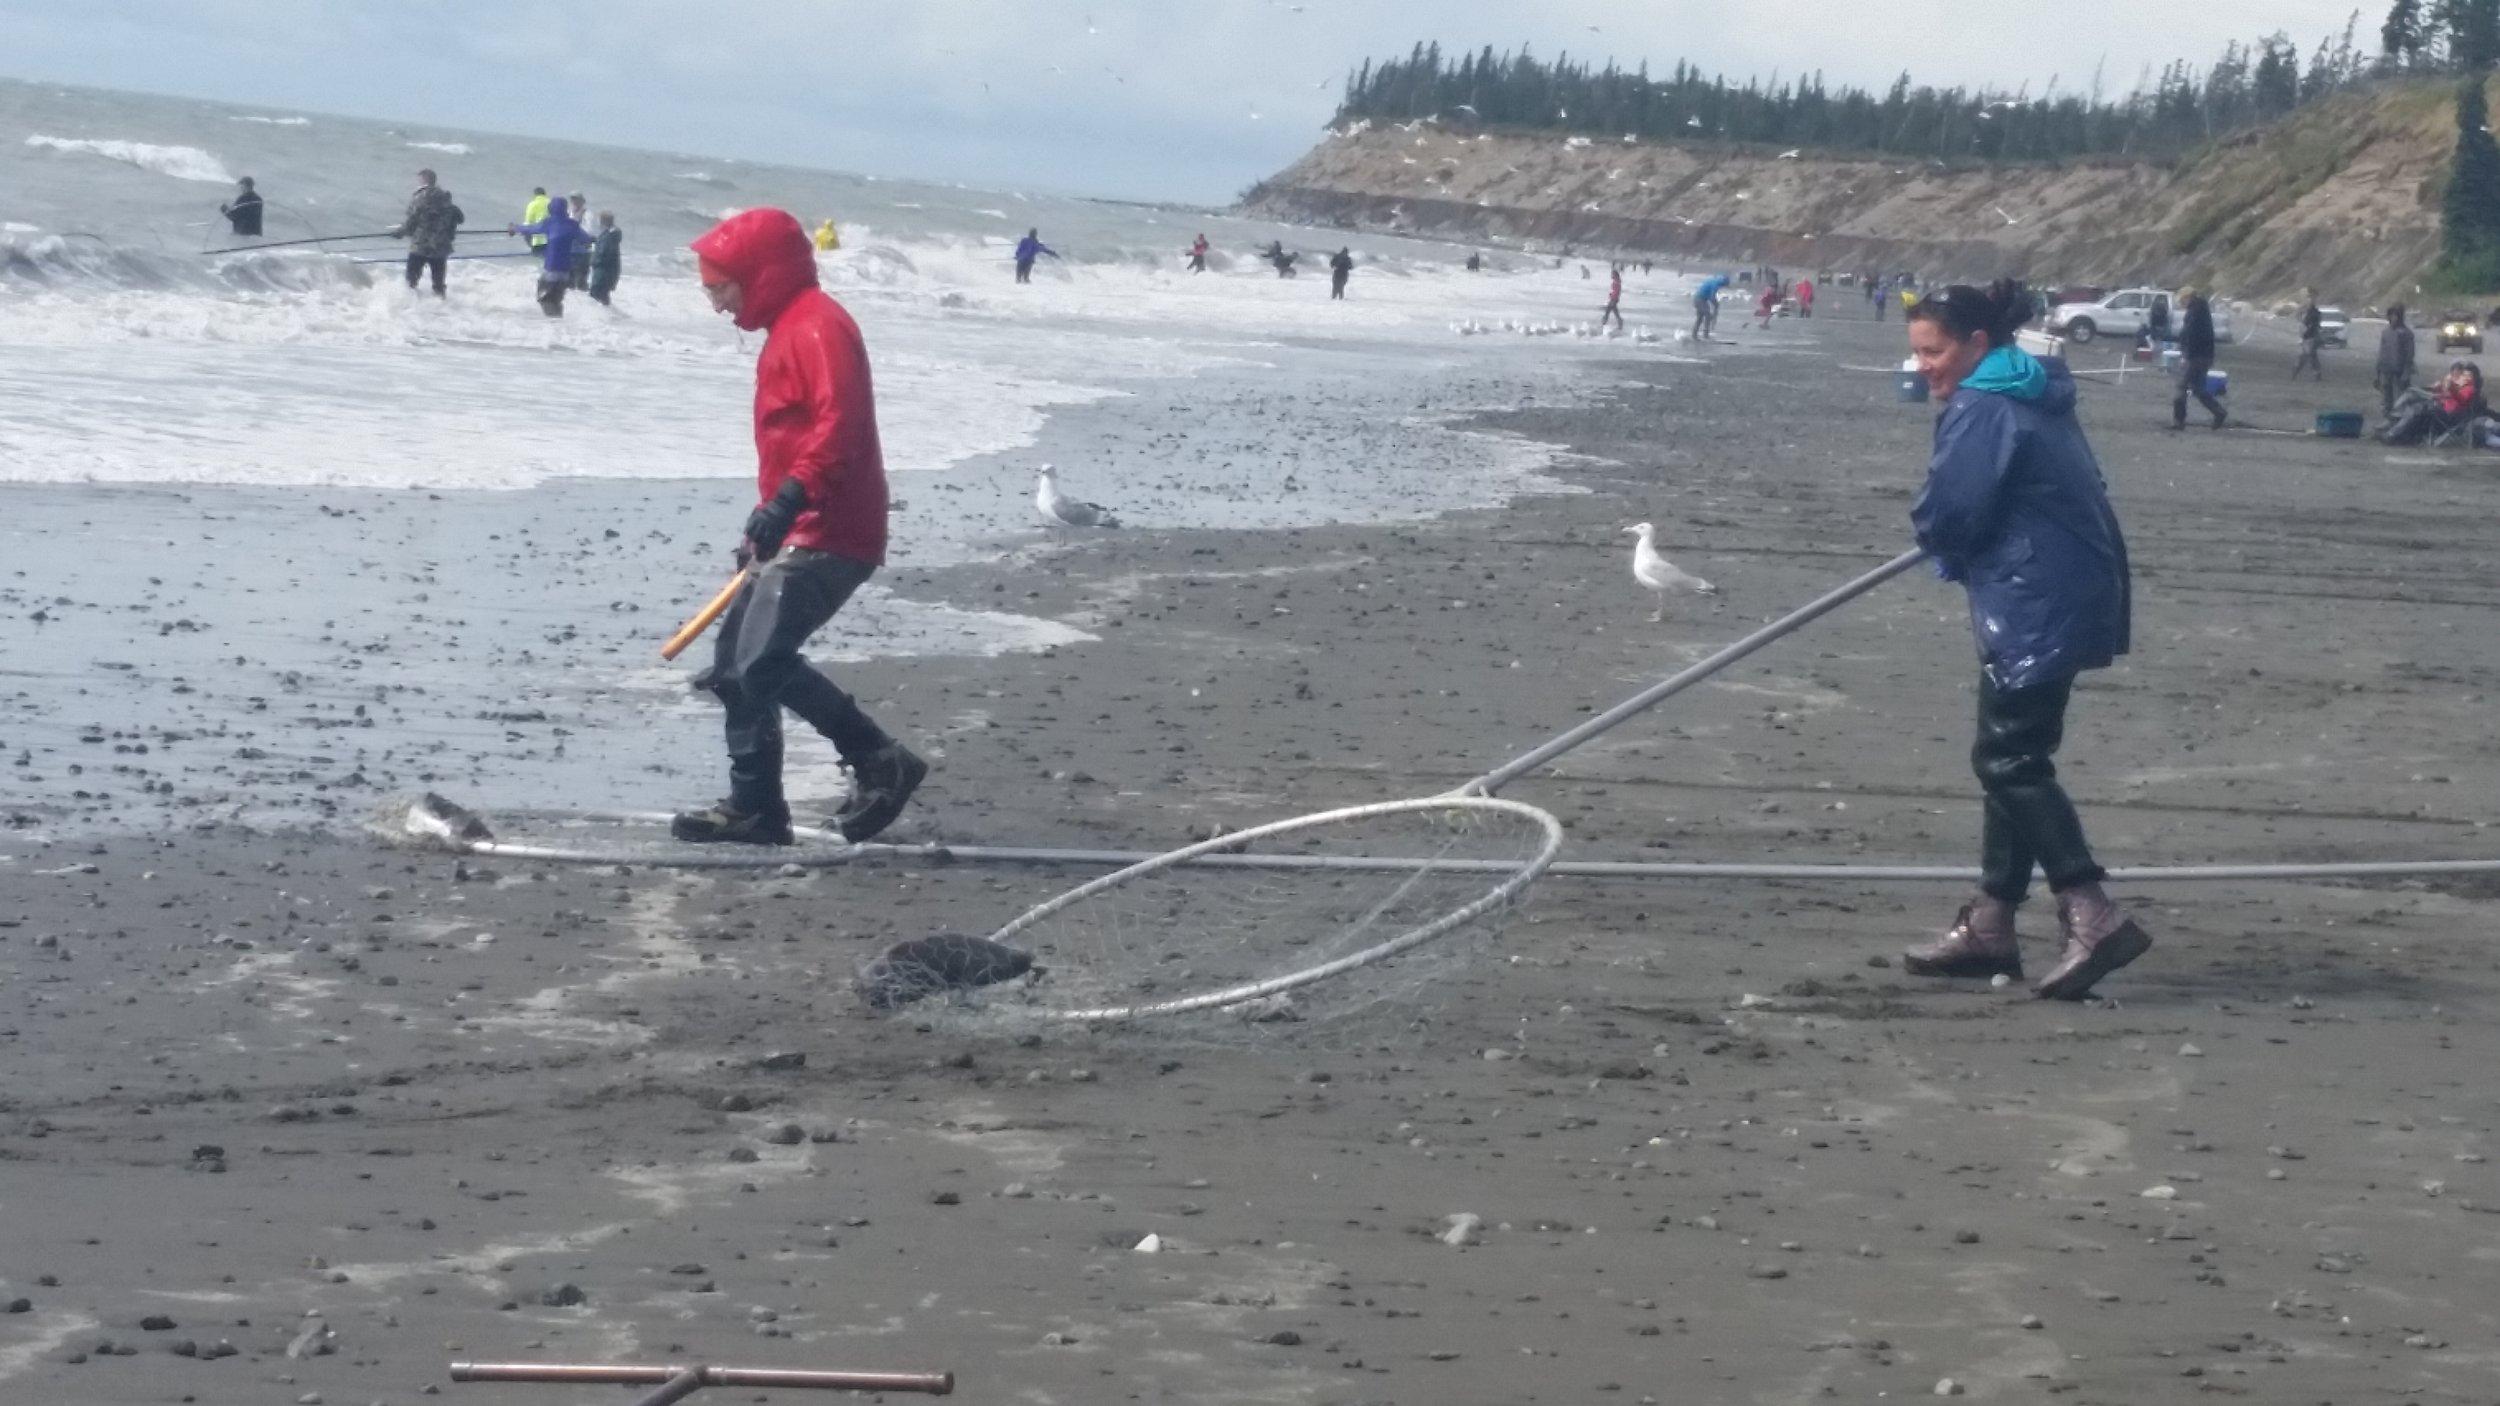 Alaska residents dipnetting for salmon along the kenai river